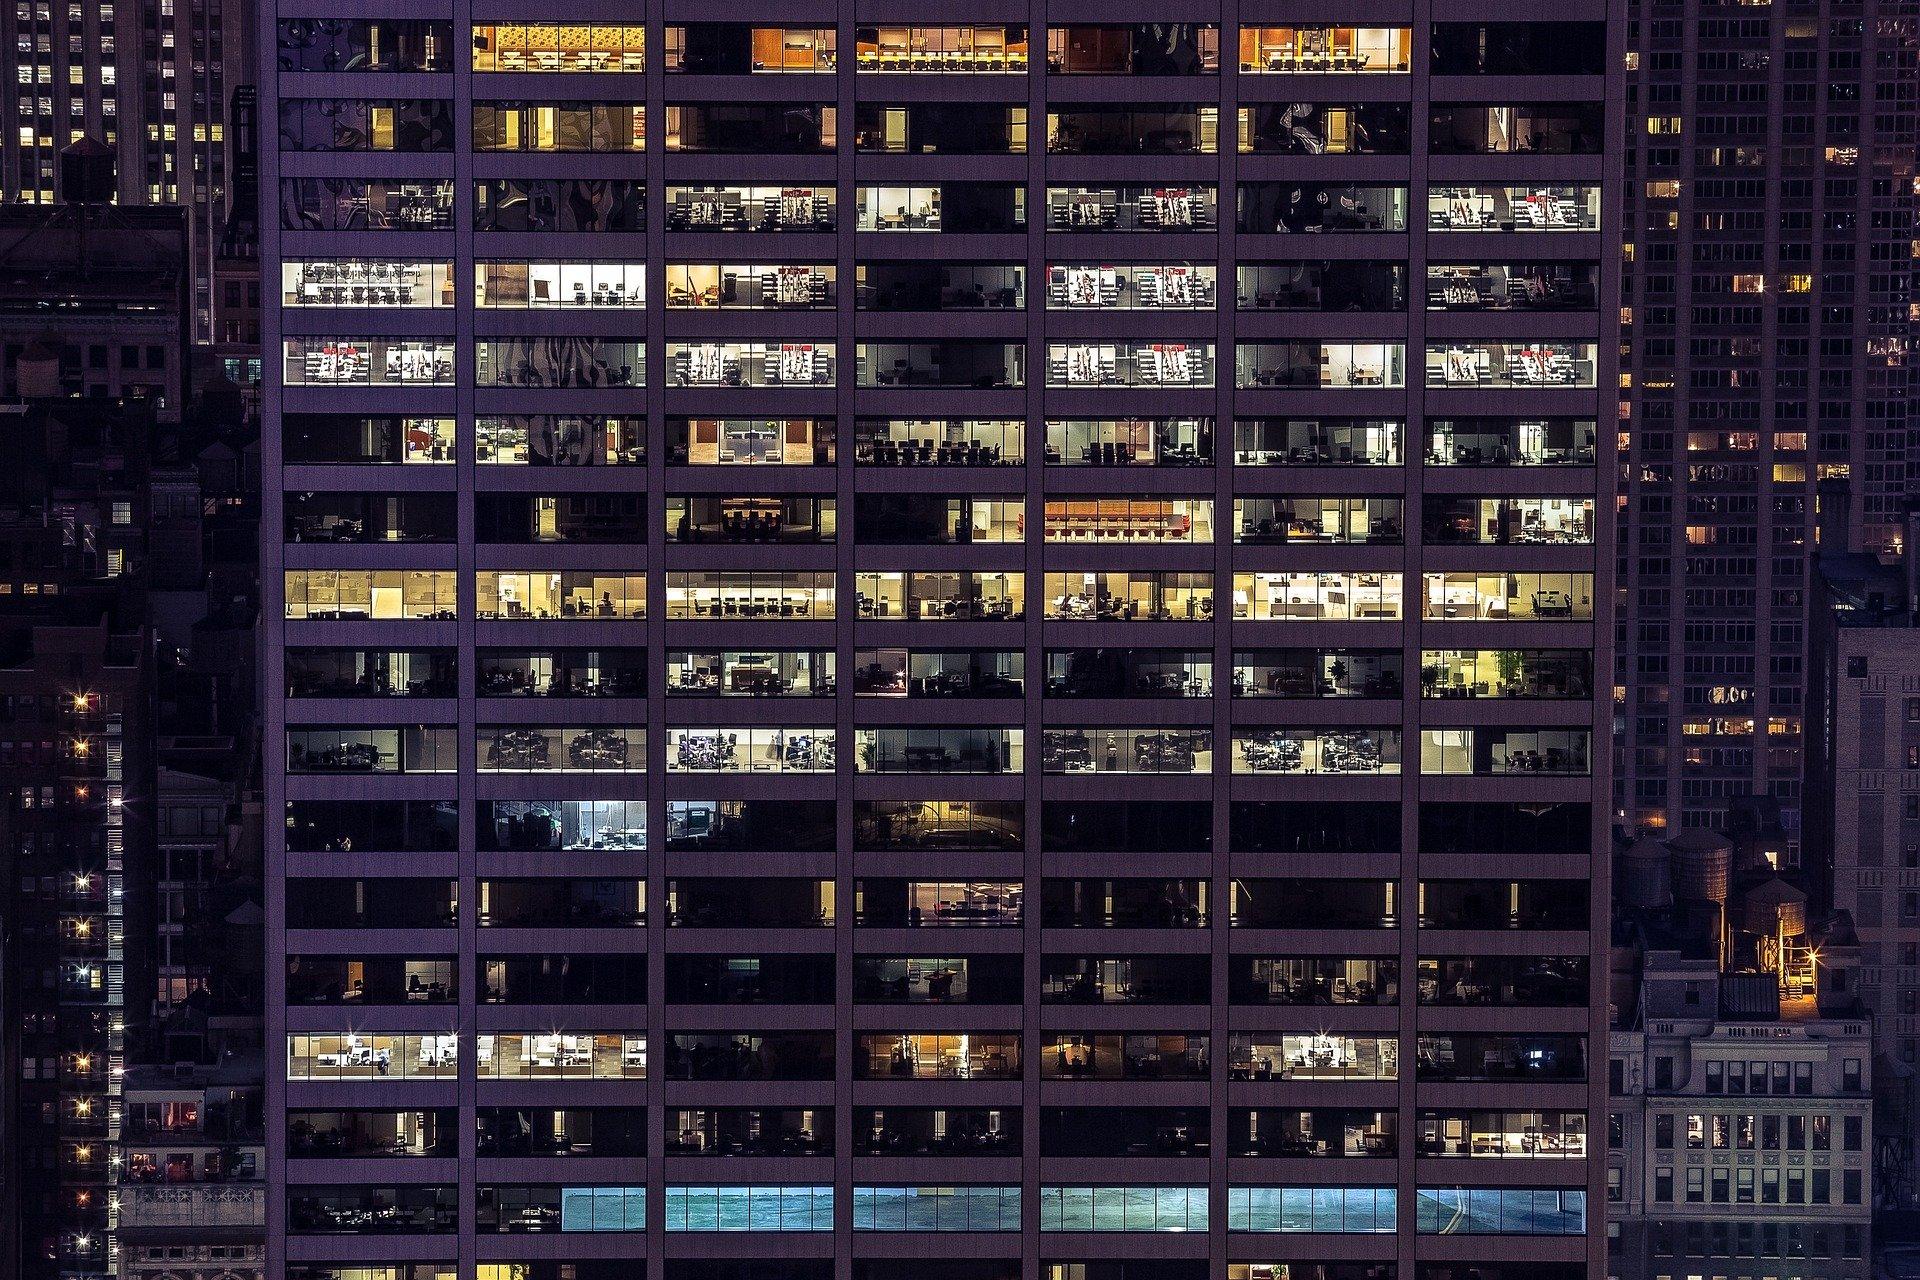 edificio-oficinas.jpg